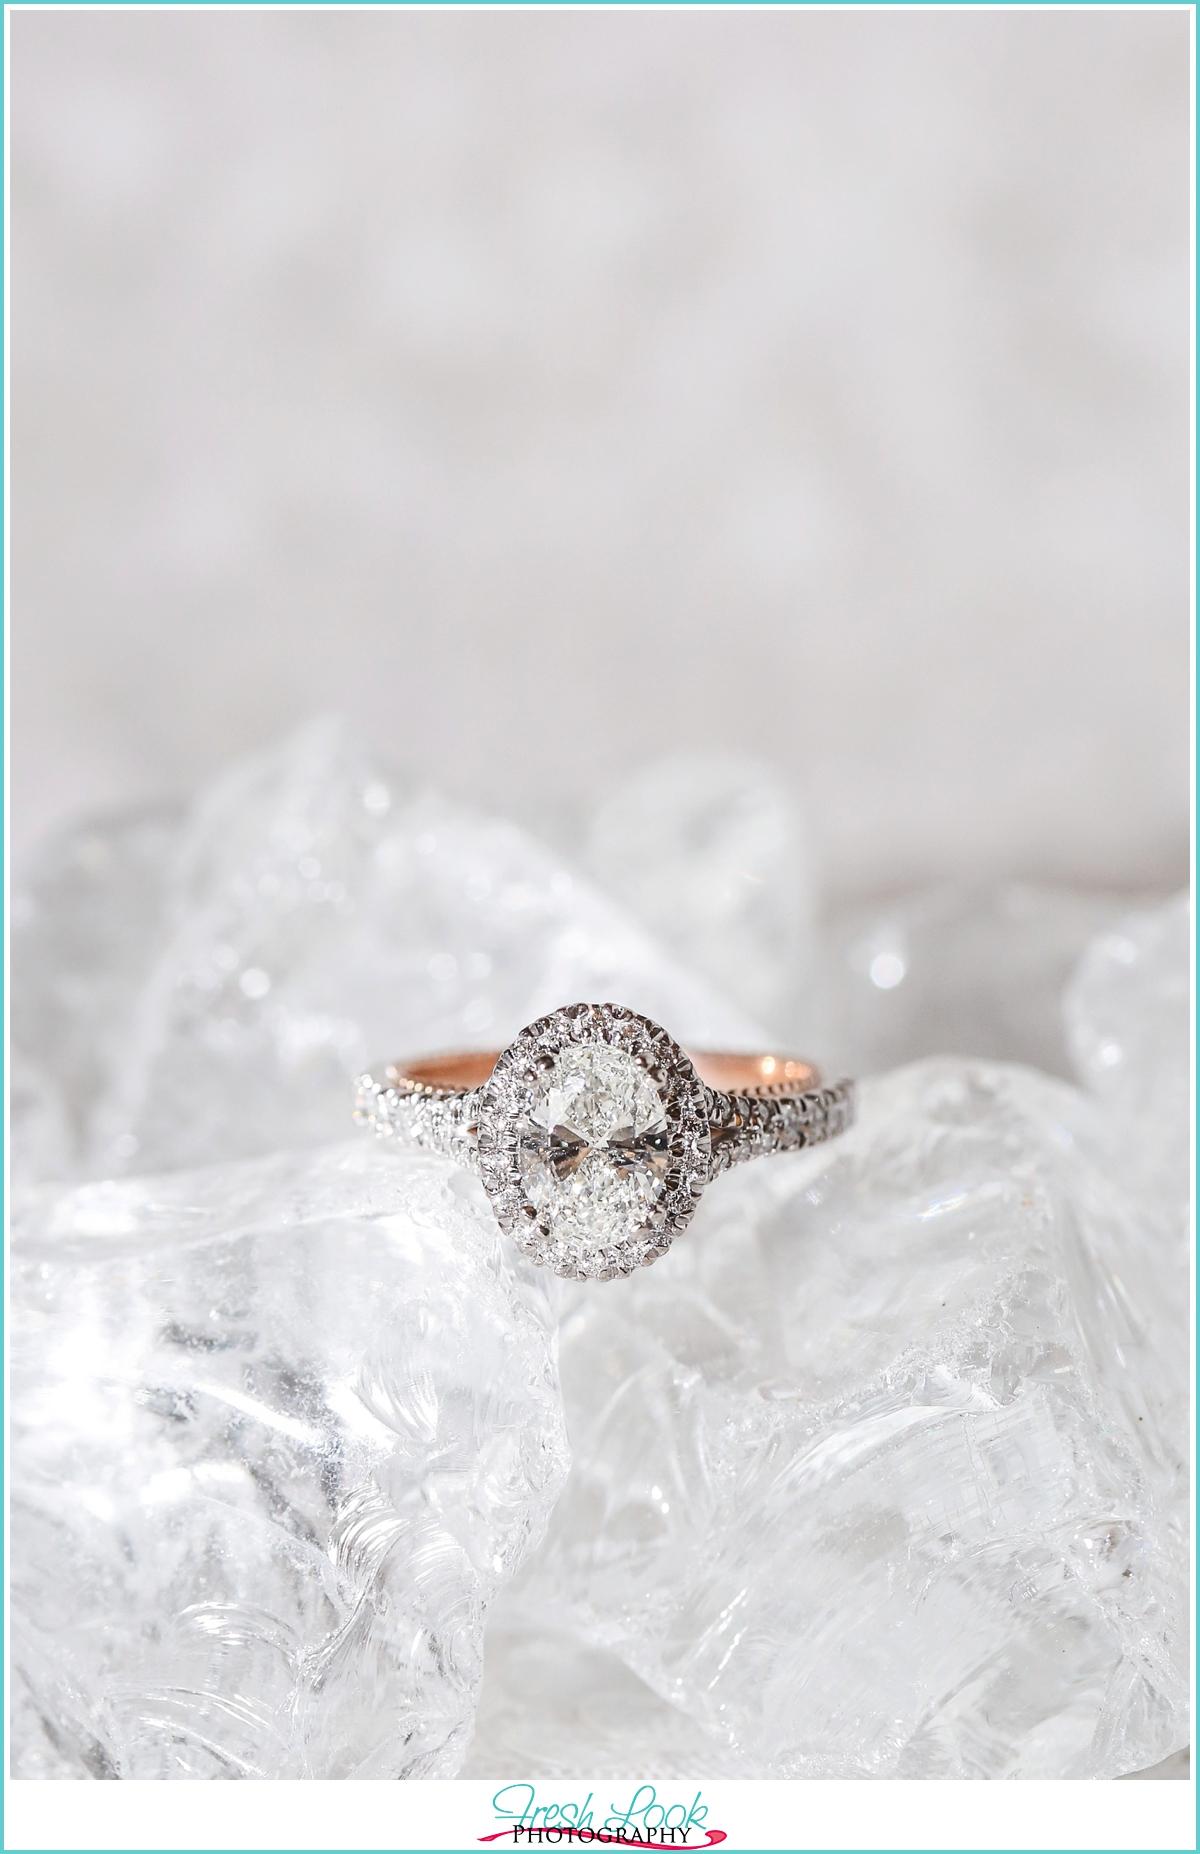 Verragio Engagement ring on ice